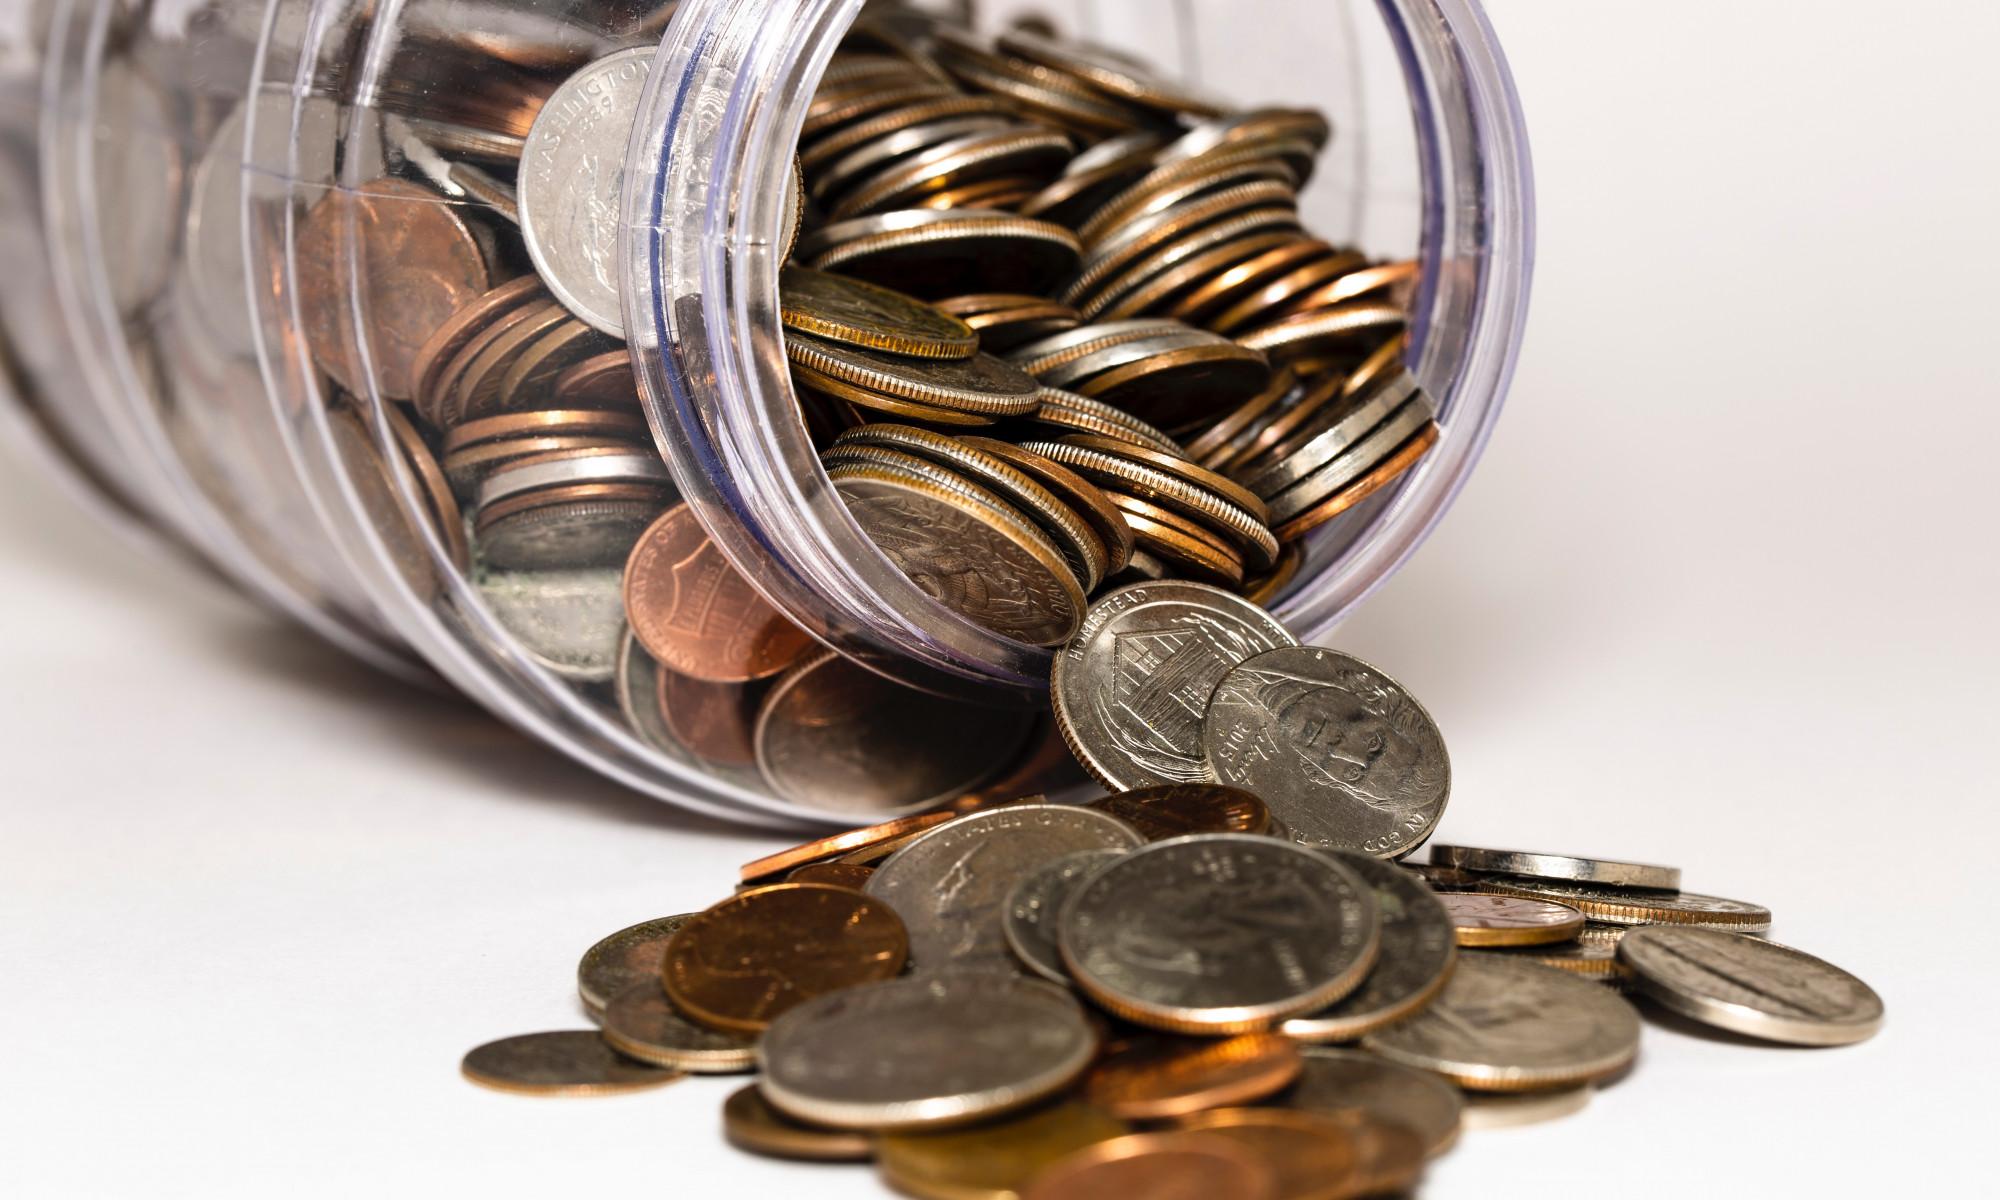 Budget: Spardose mit Cents